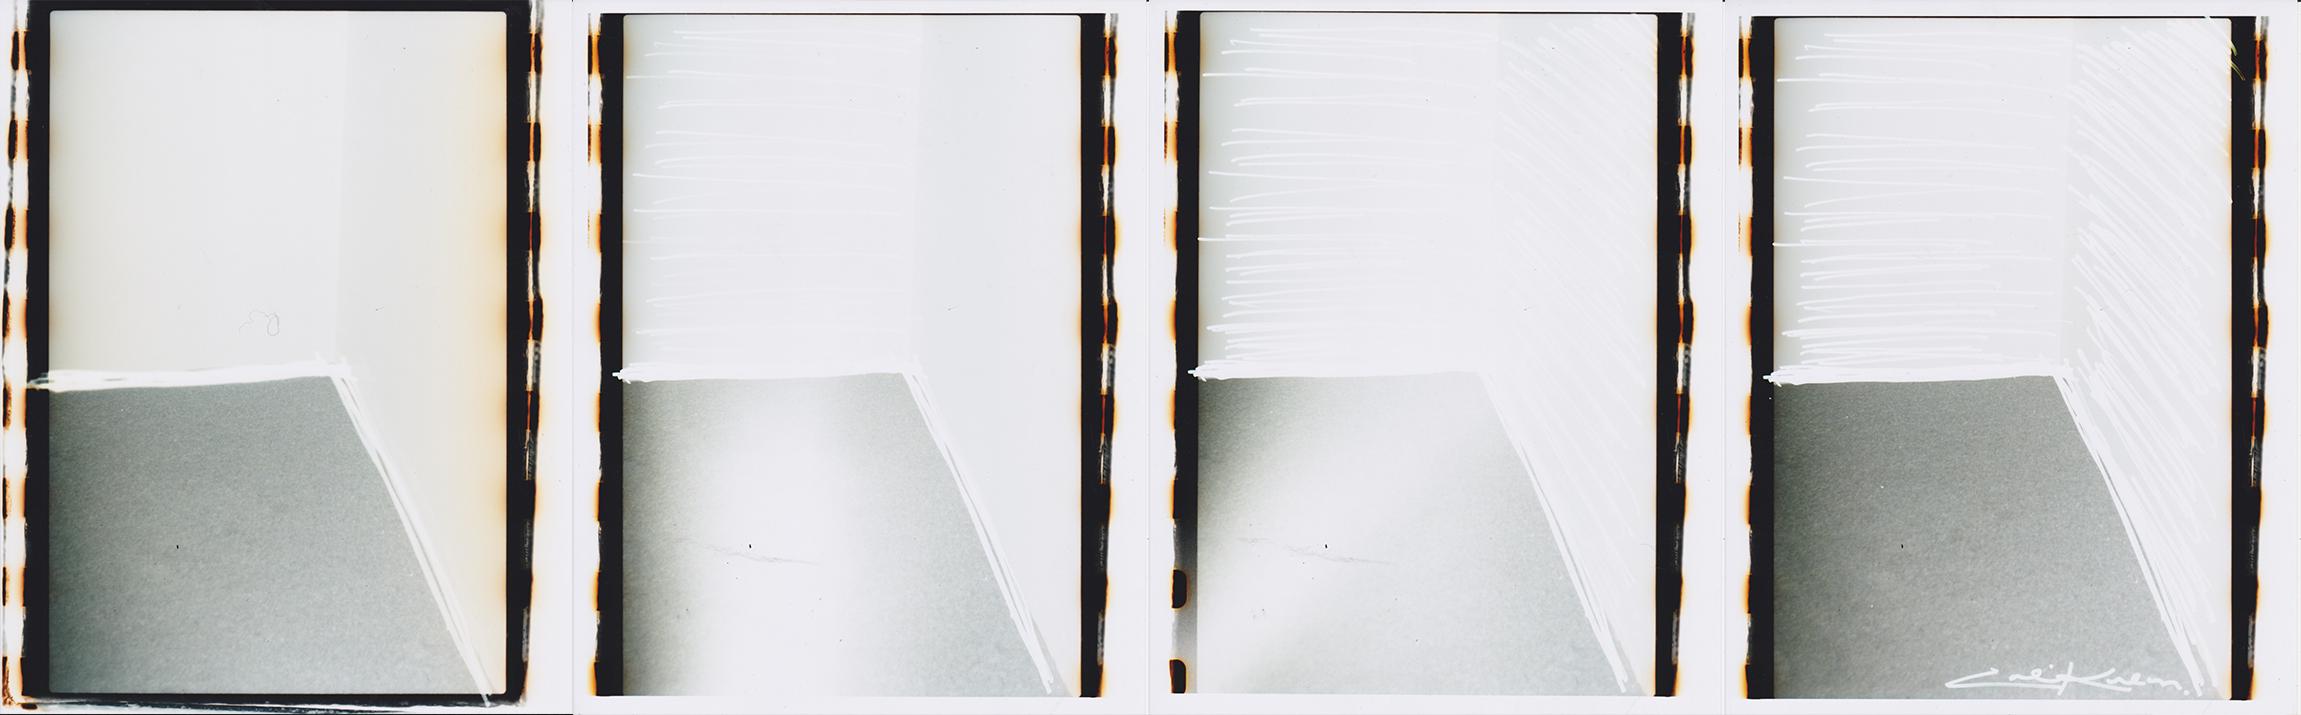 Photoshop White Wall Erasure , 2017, Chromogenic Print